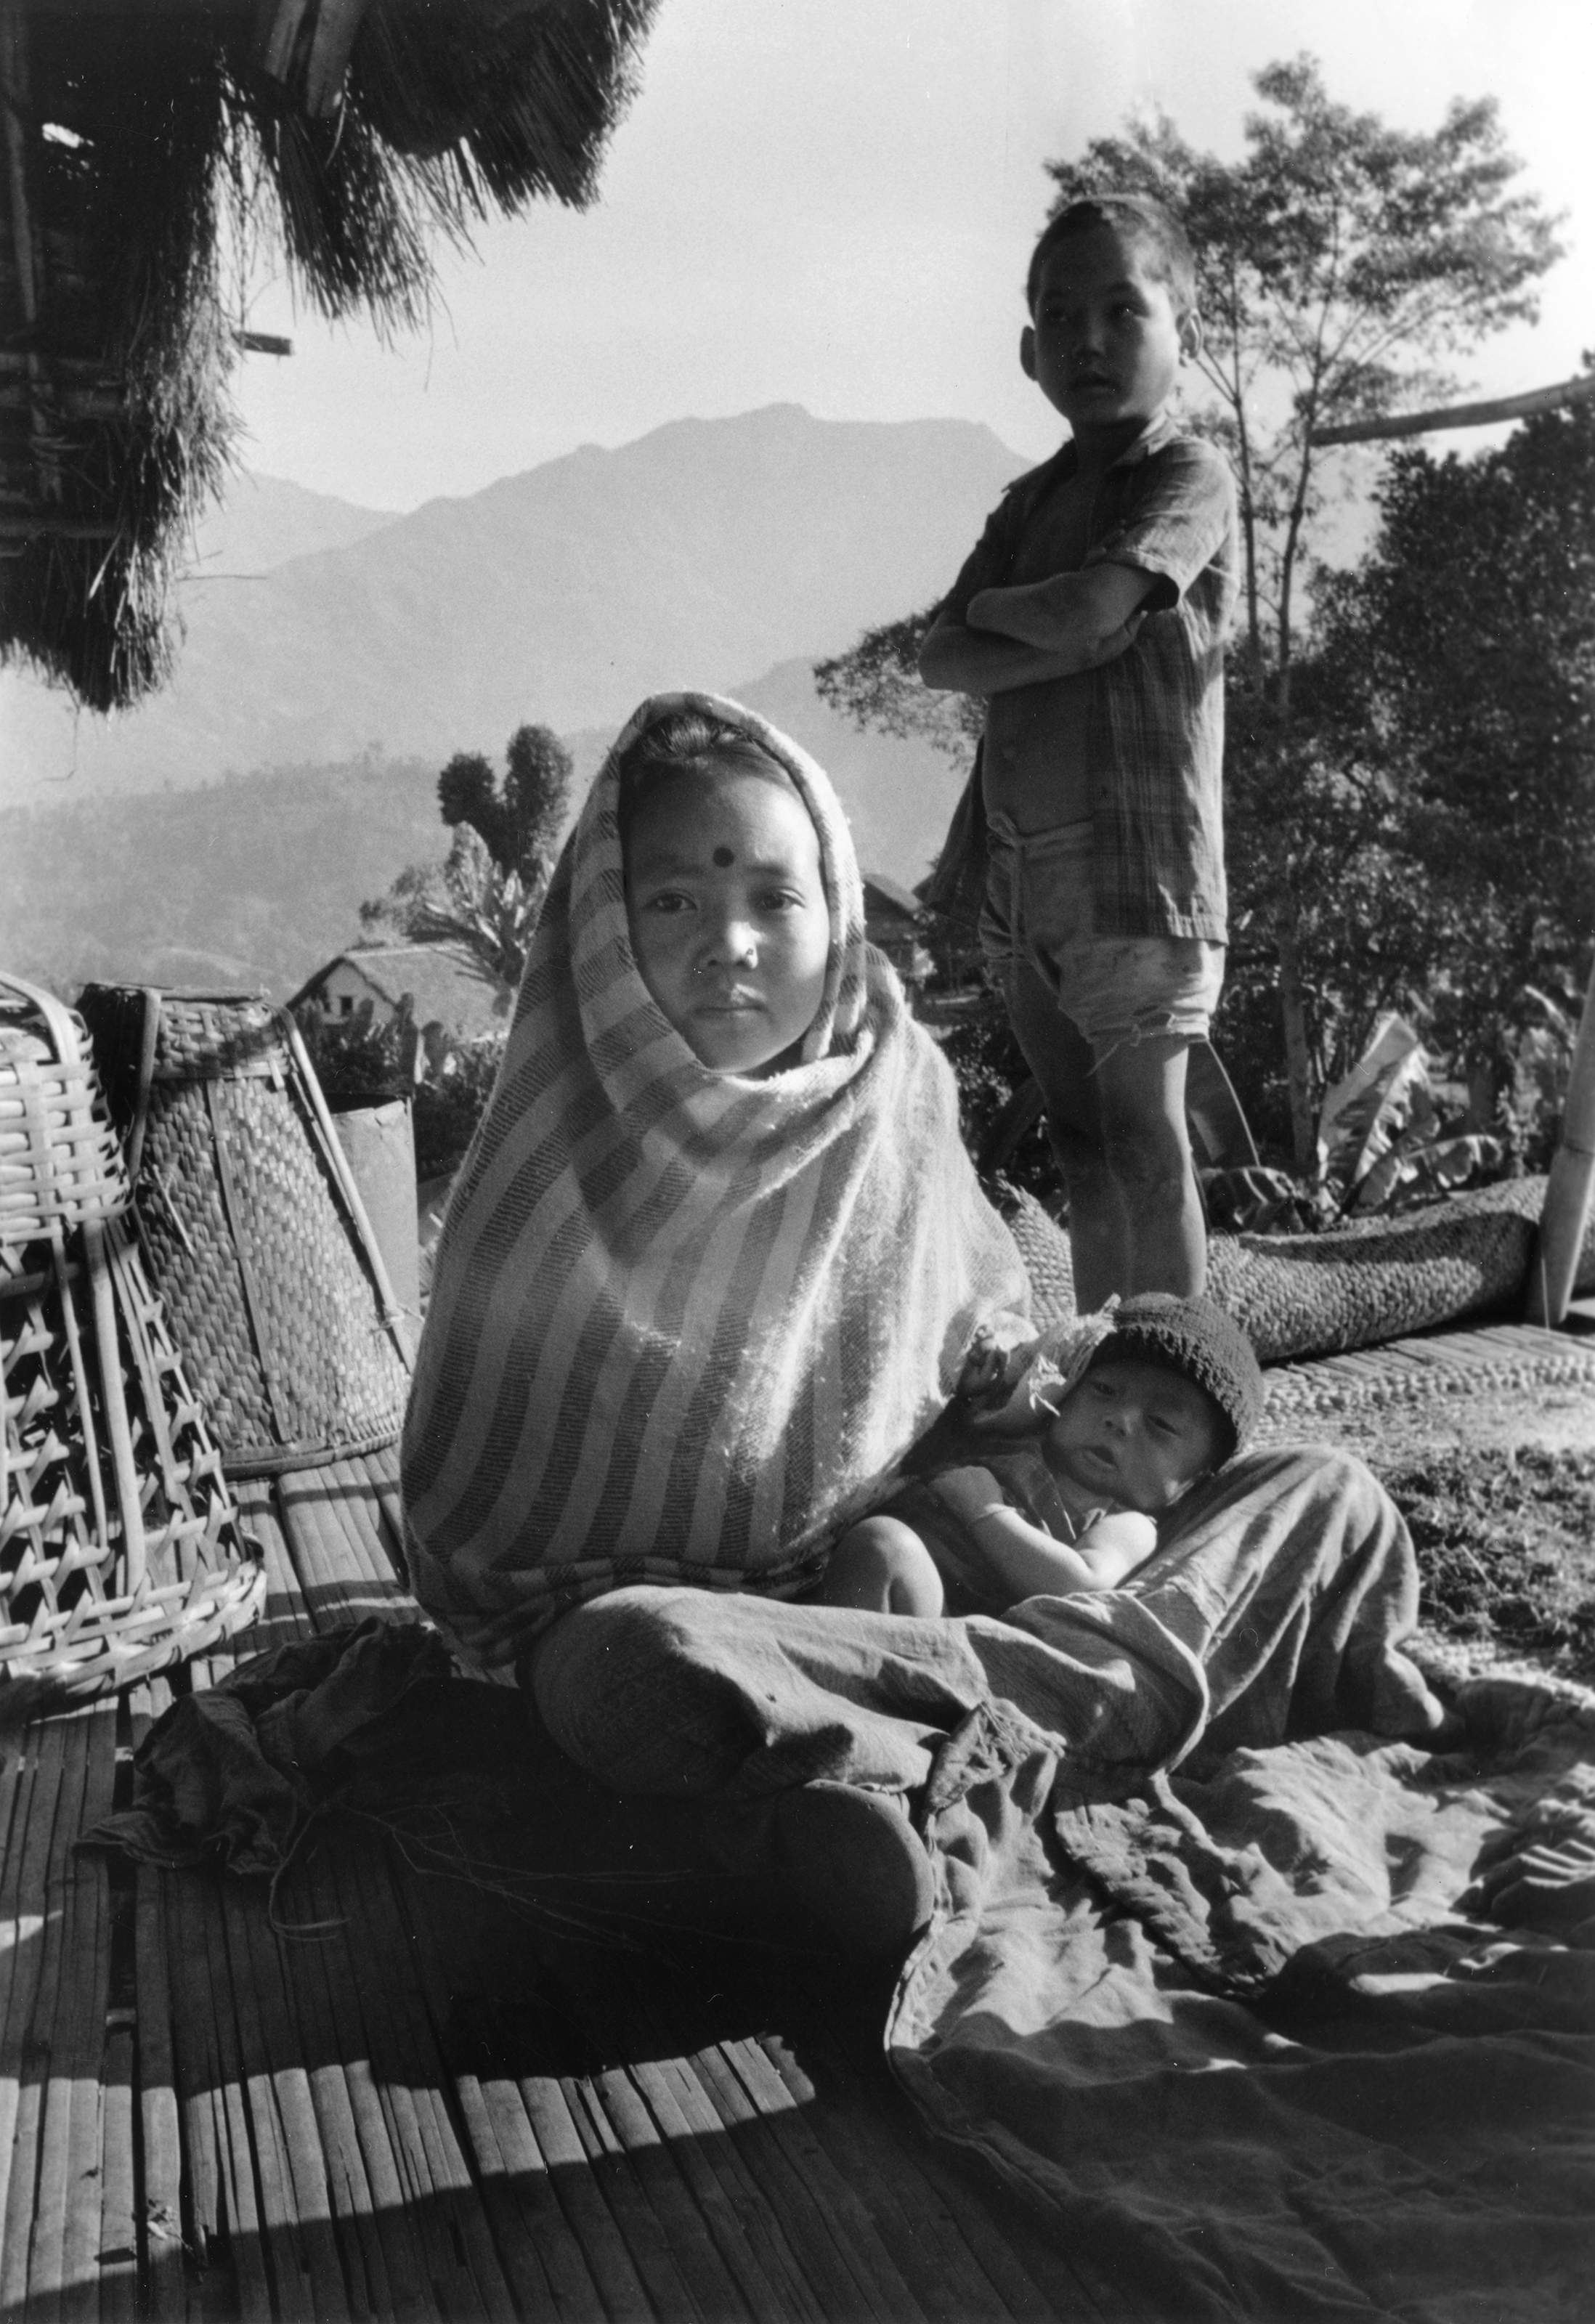 Nepal-03-edit.jpg